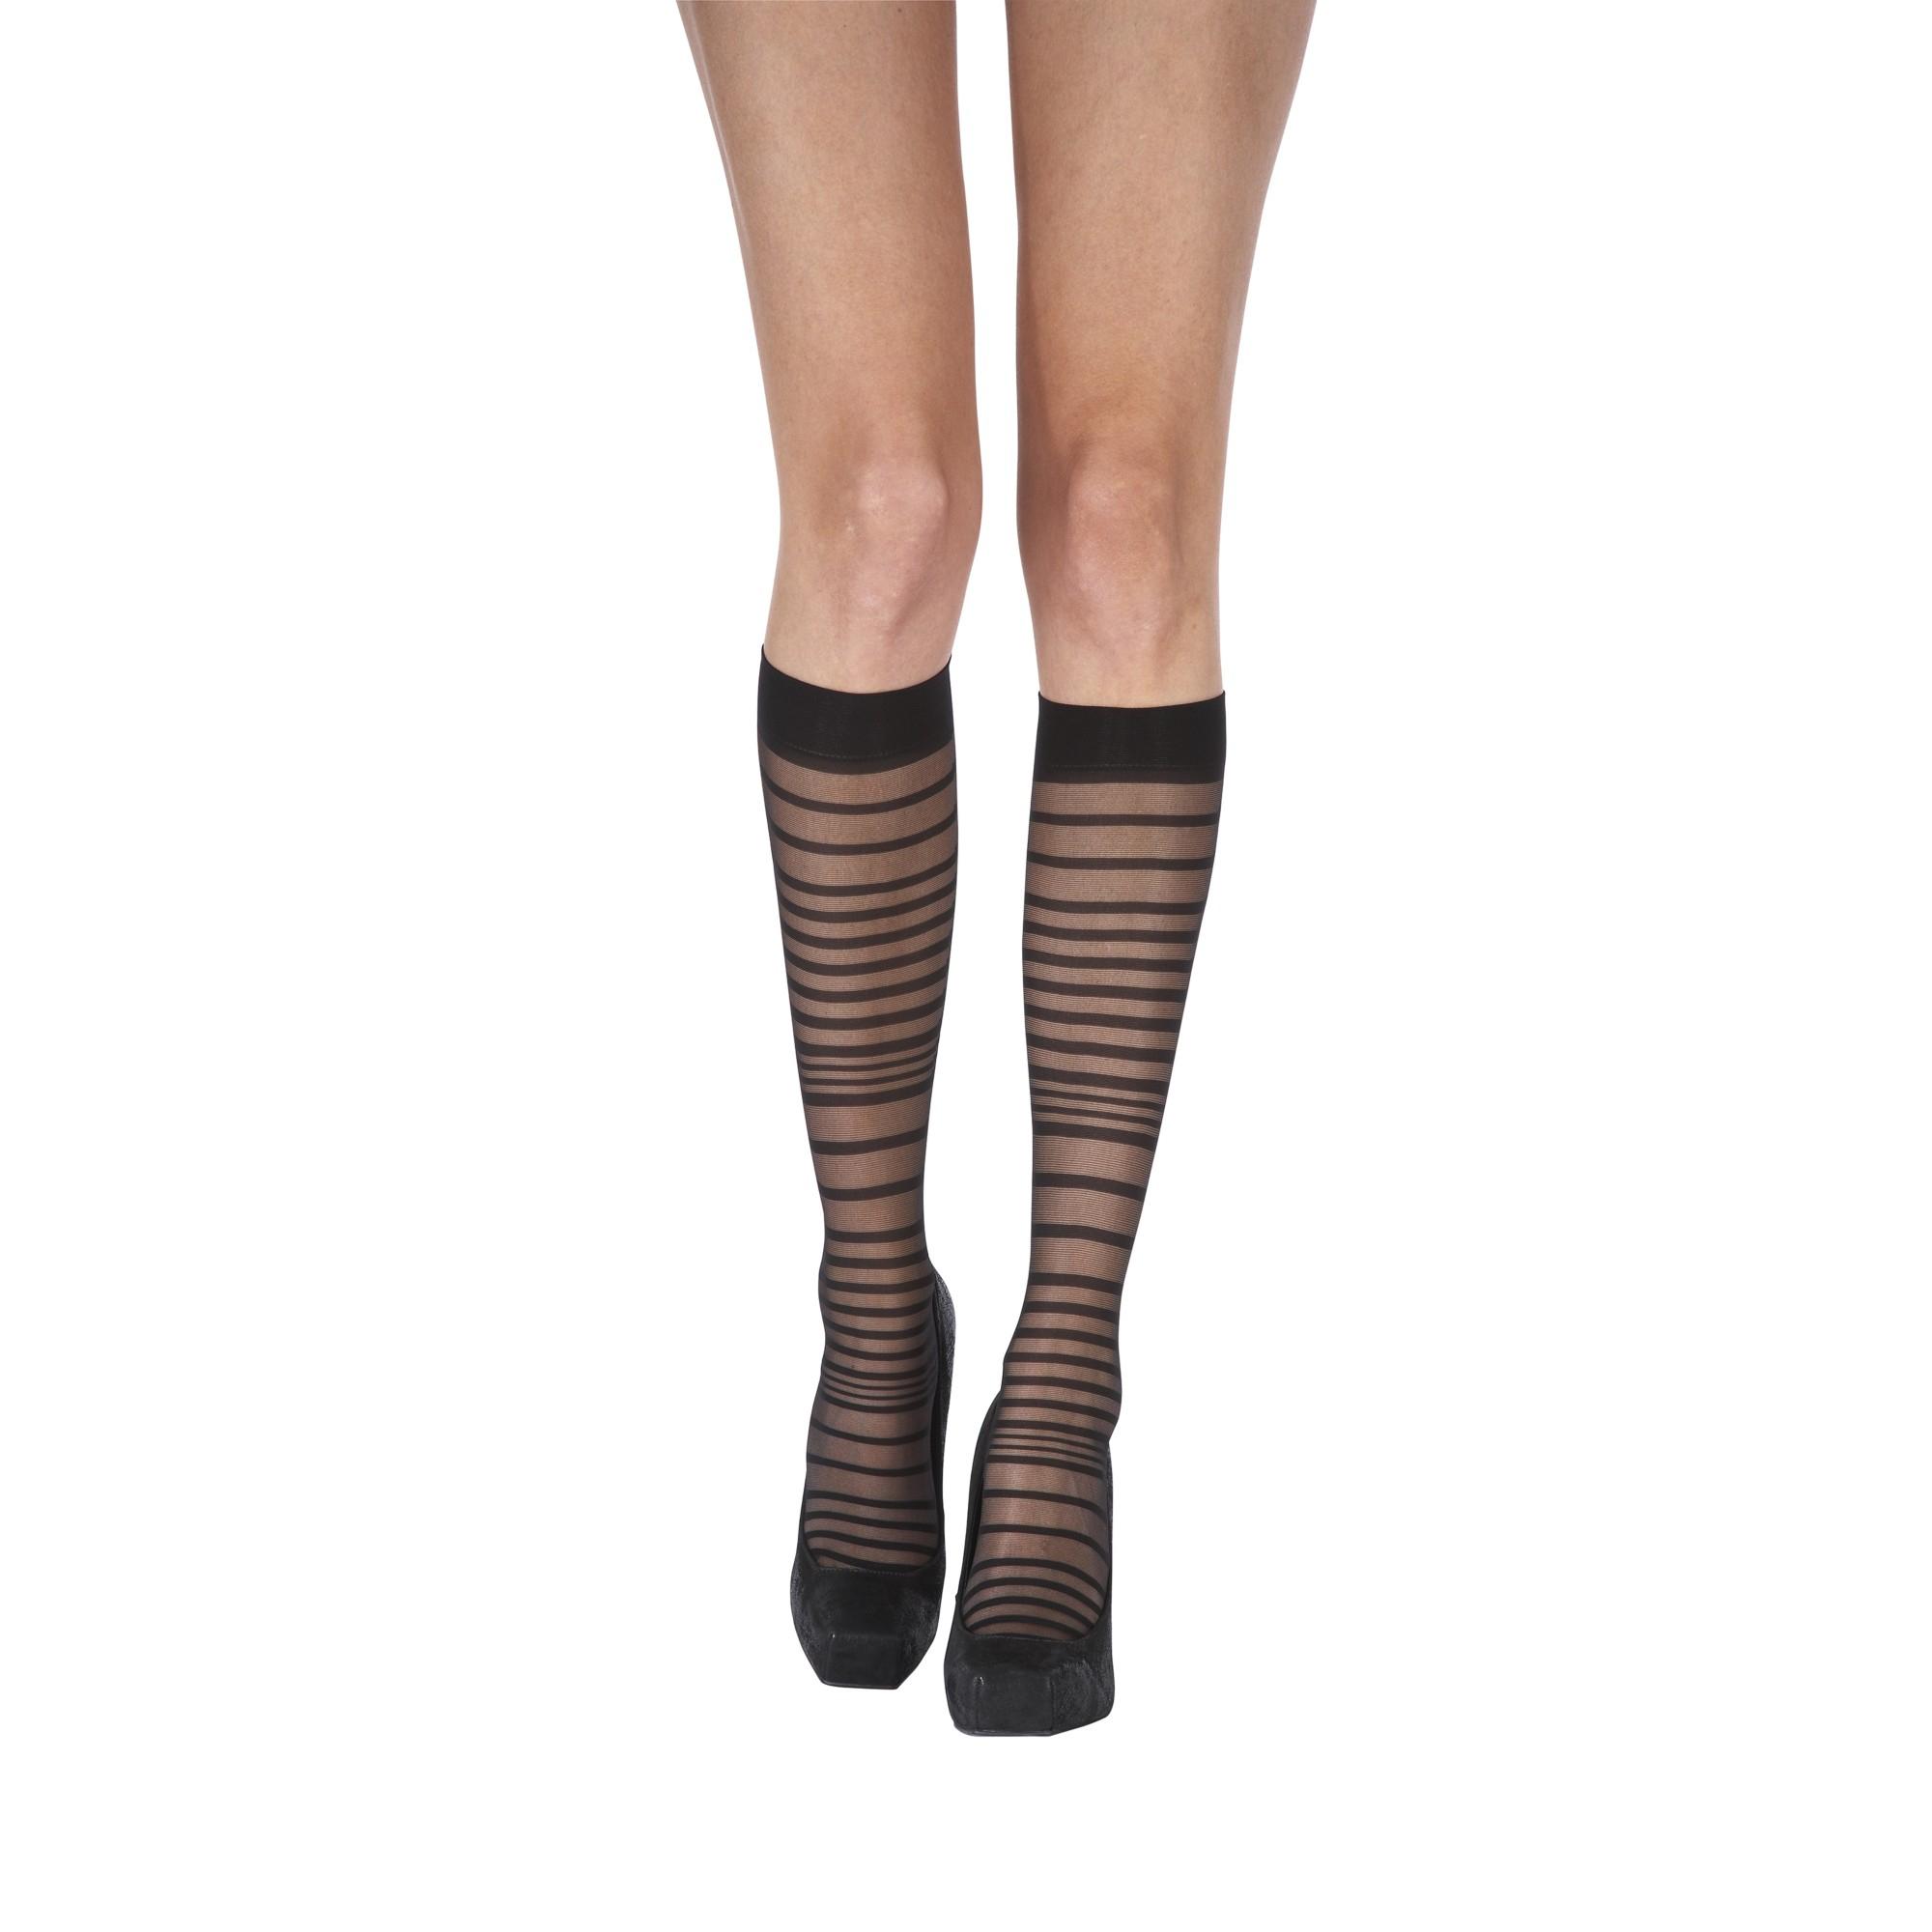 91cb37471 Pretty Polly Animal Pattern Stripe Knee High Tights in Black - Lyst